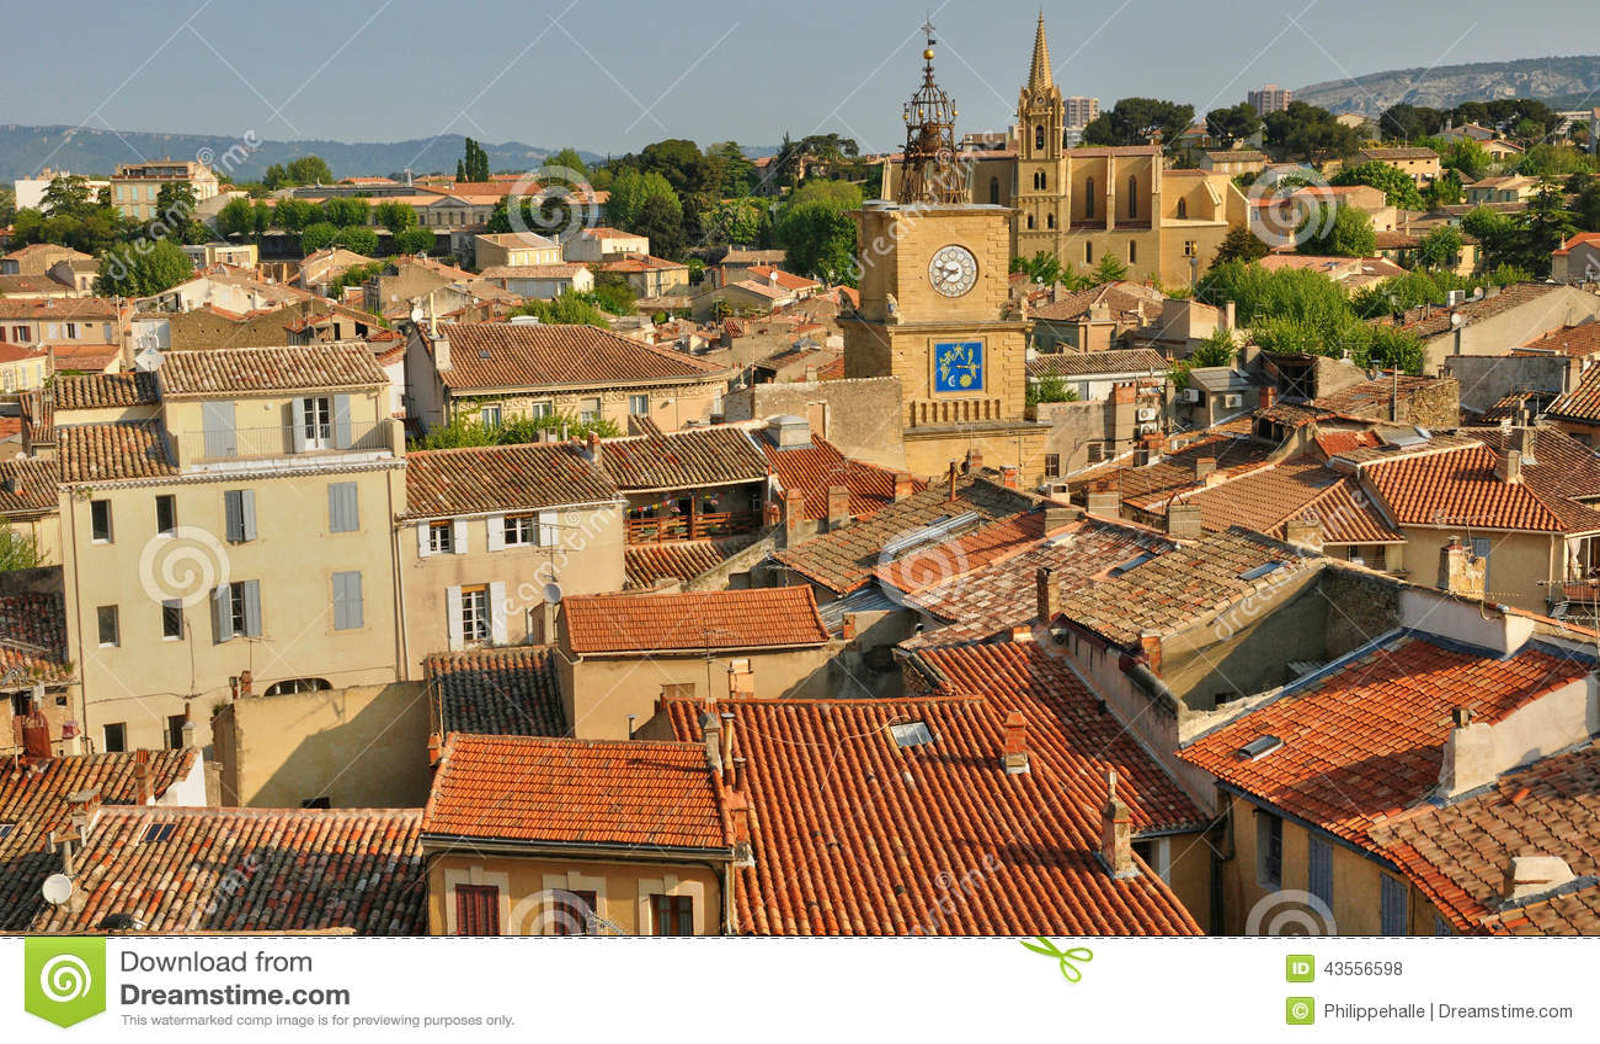 Frankrijk bouche du de rh ne stad van salon de provence redactionele stock foto afbeelding - Salon de provence departement ...